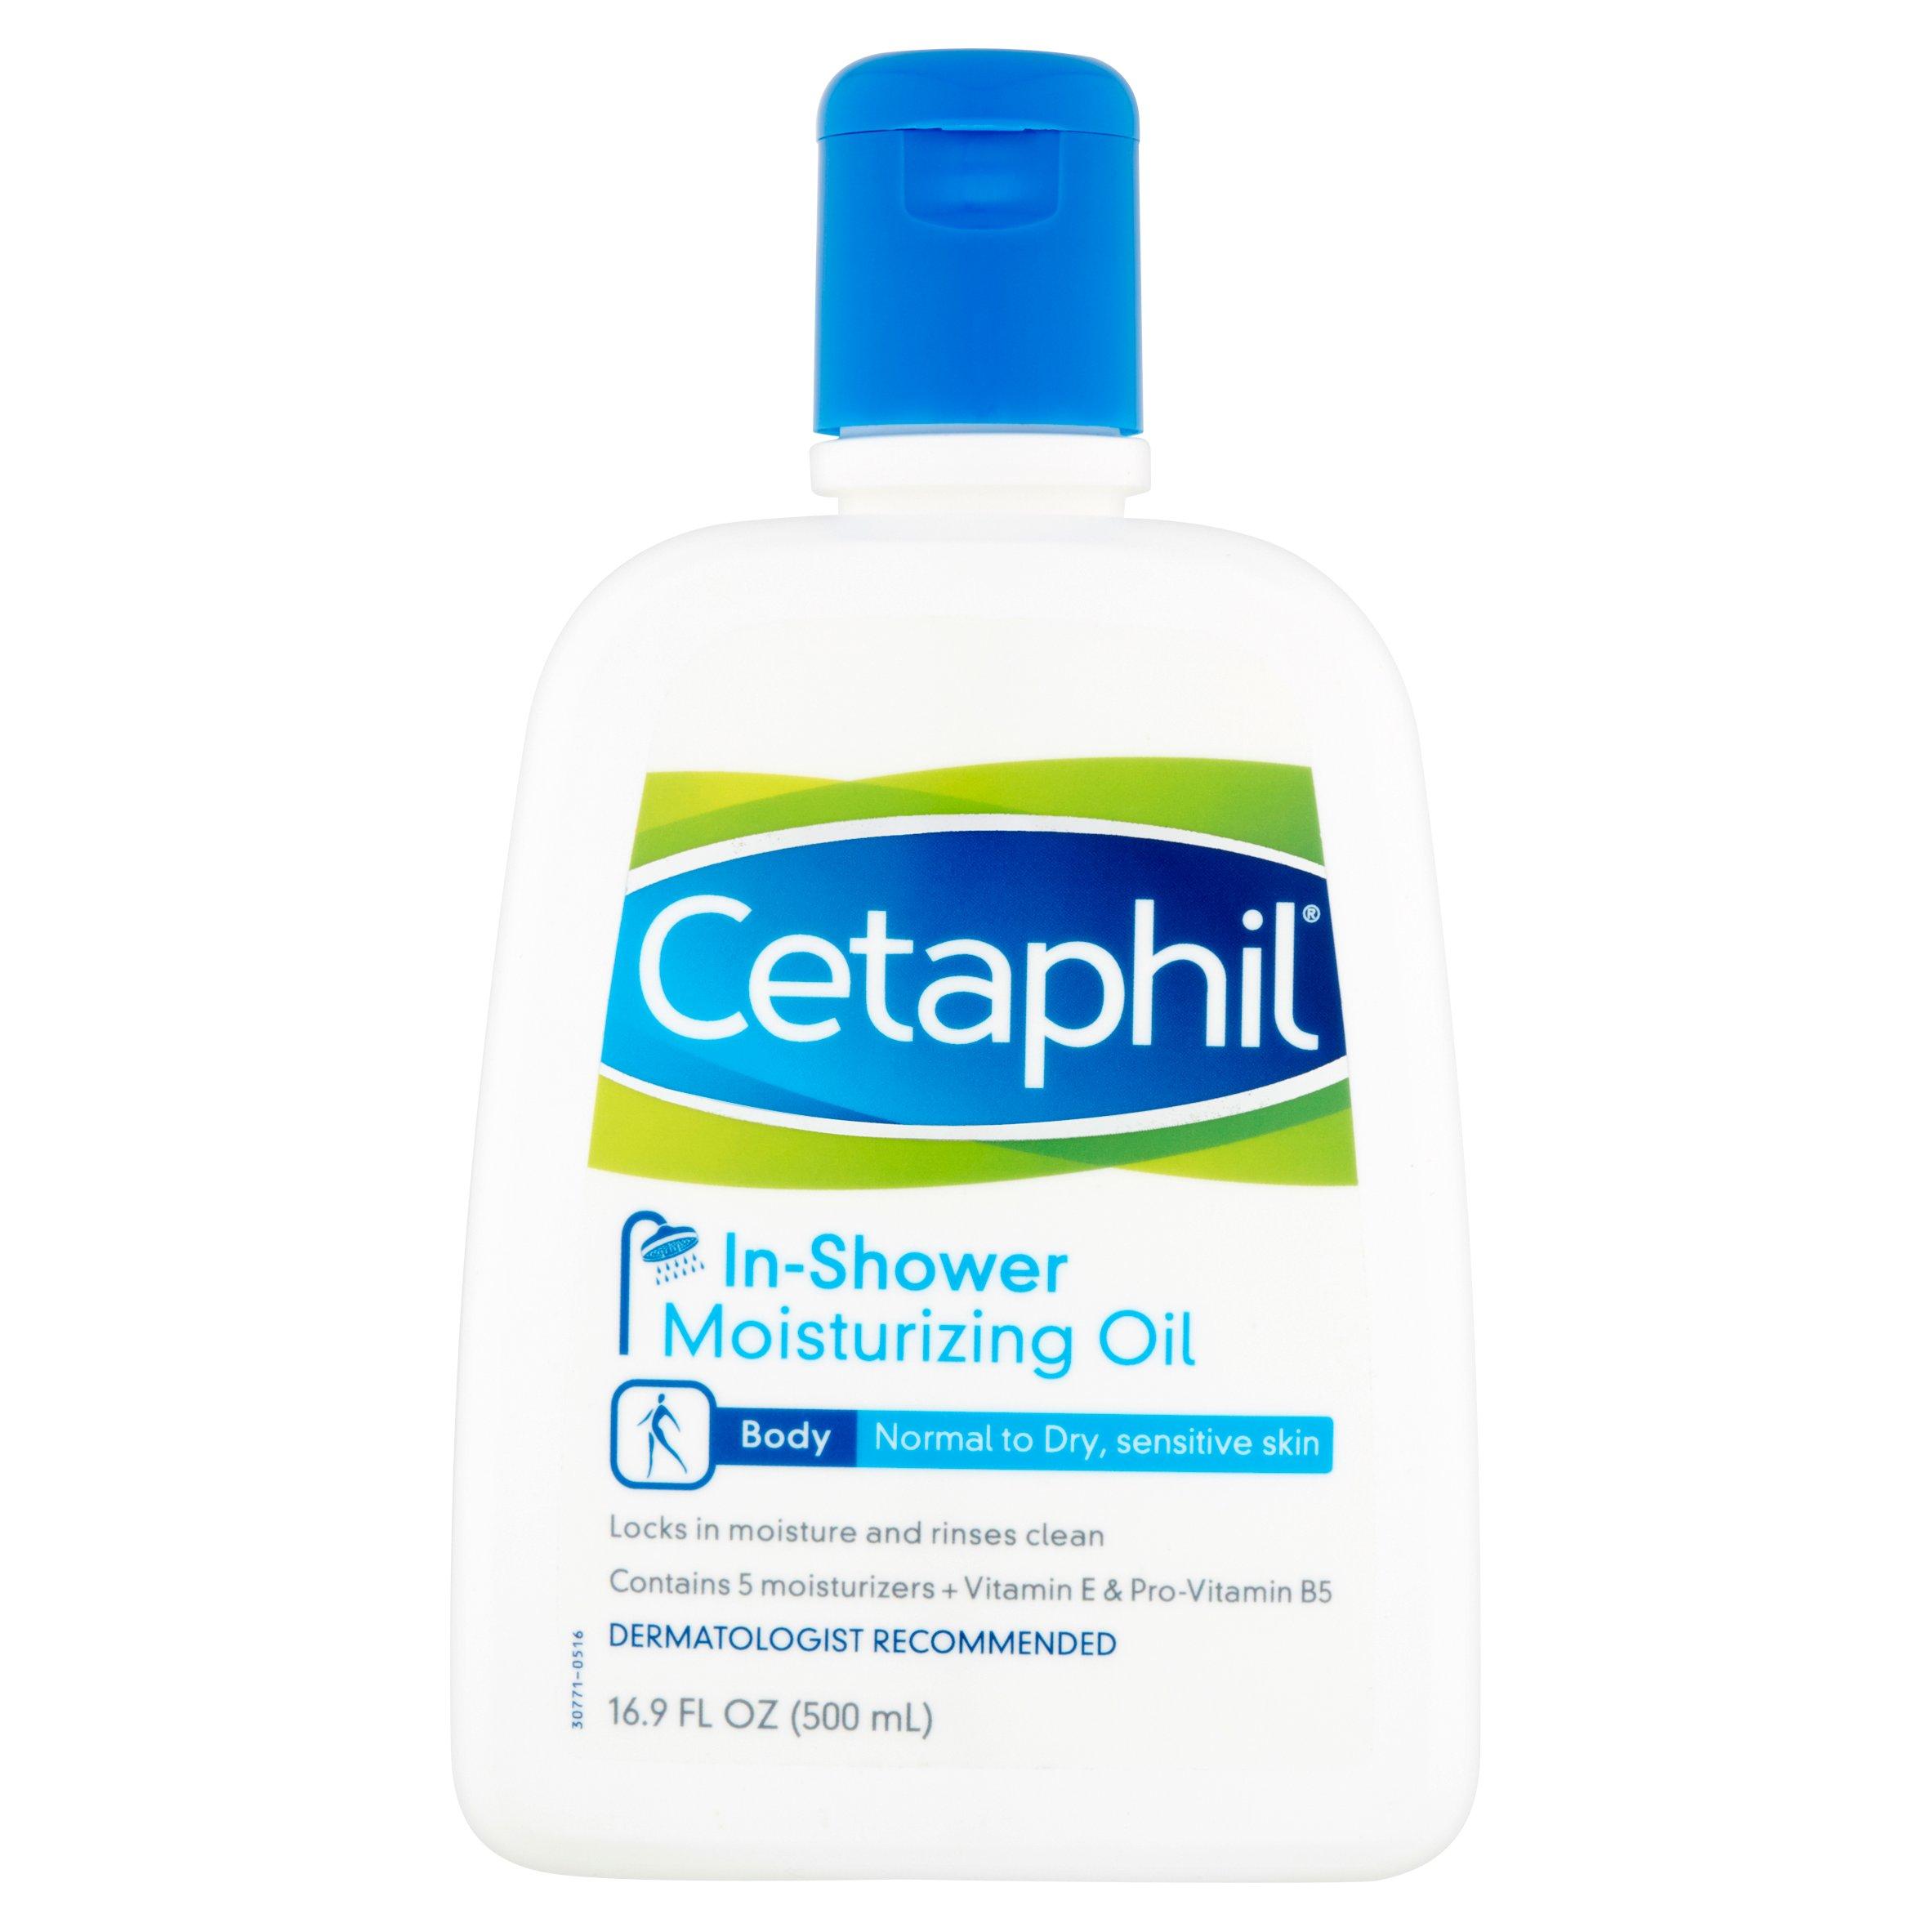 Cetaphil In-Shower Moisturizing Oil, 16.9 fl oz